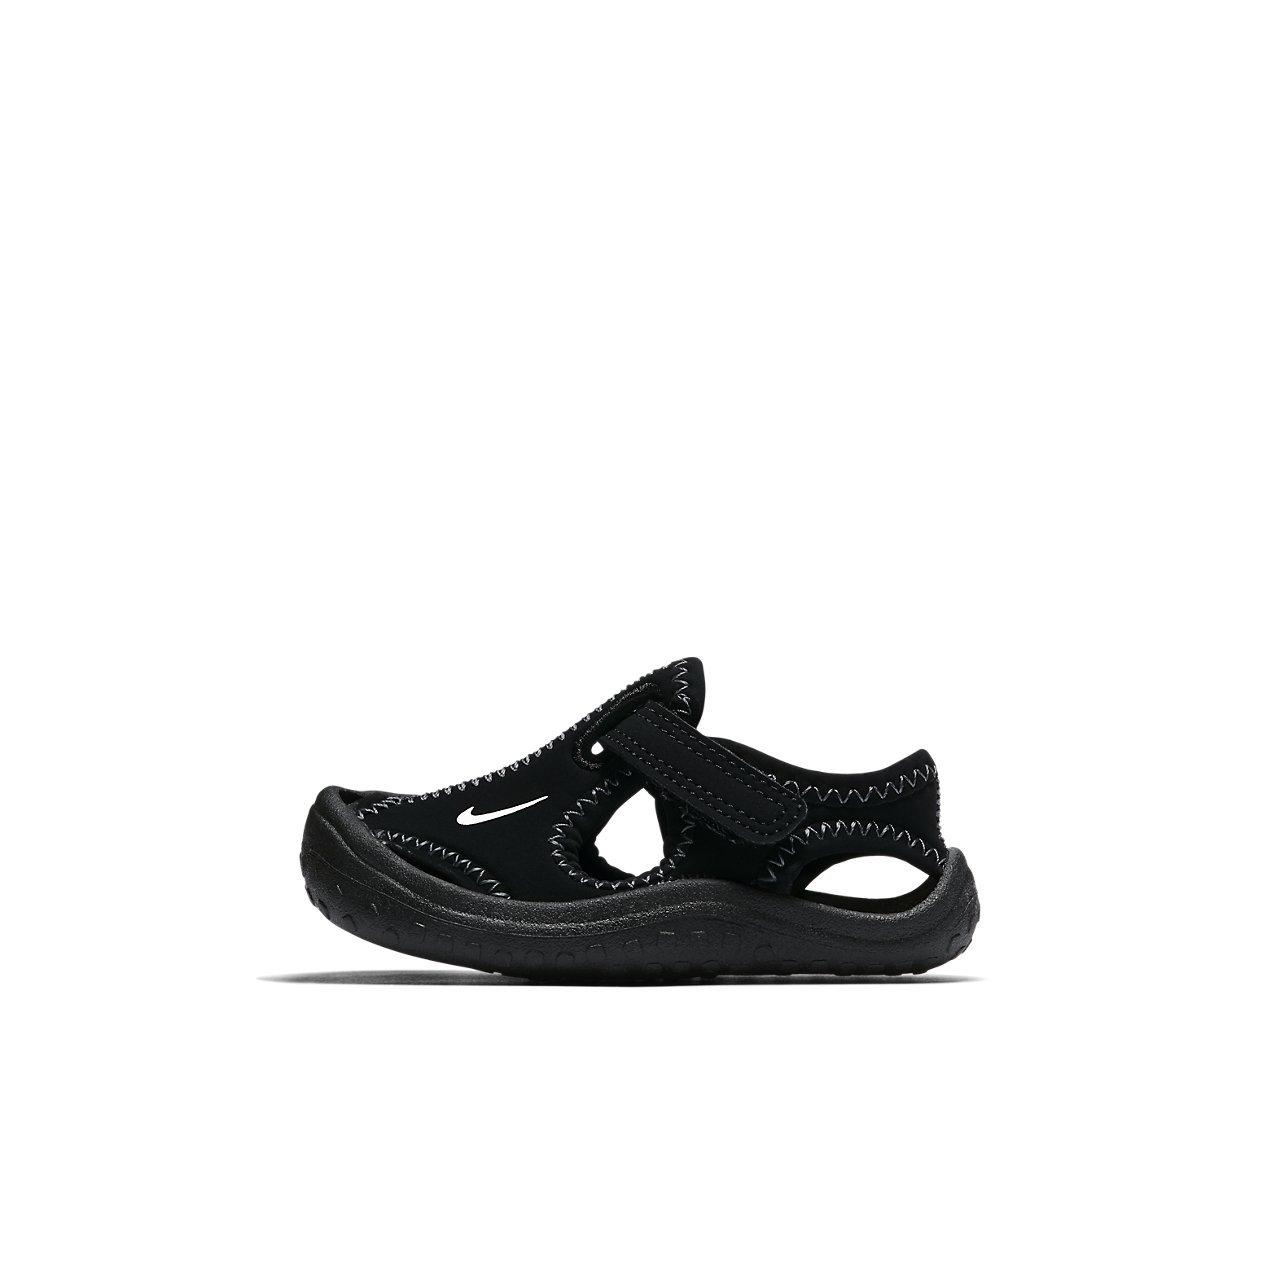 Nike 903632-001 Boys Sunray Protect (TD) Toddler Sandal